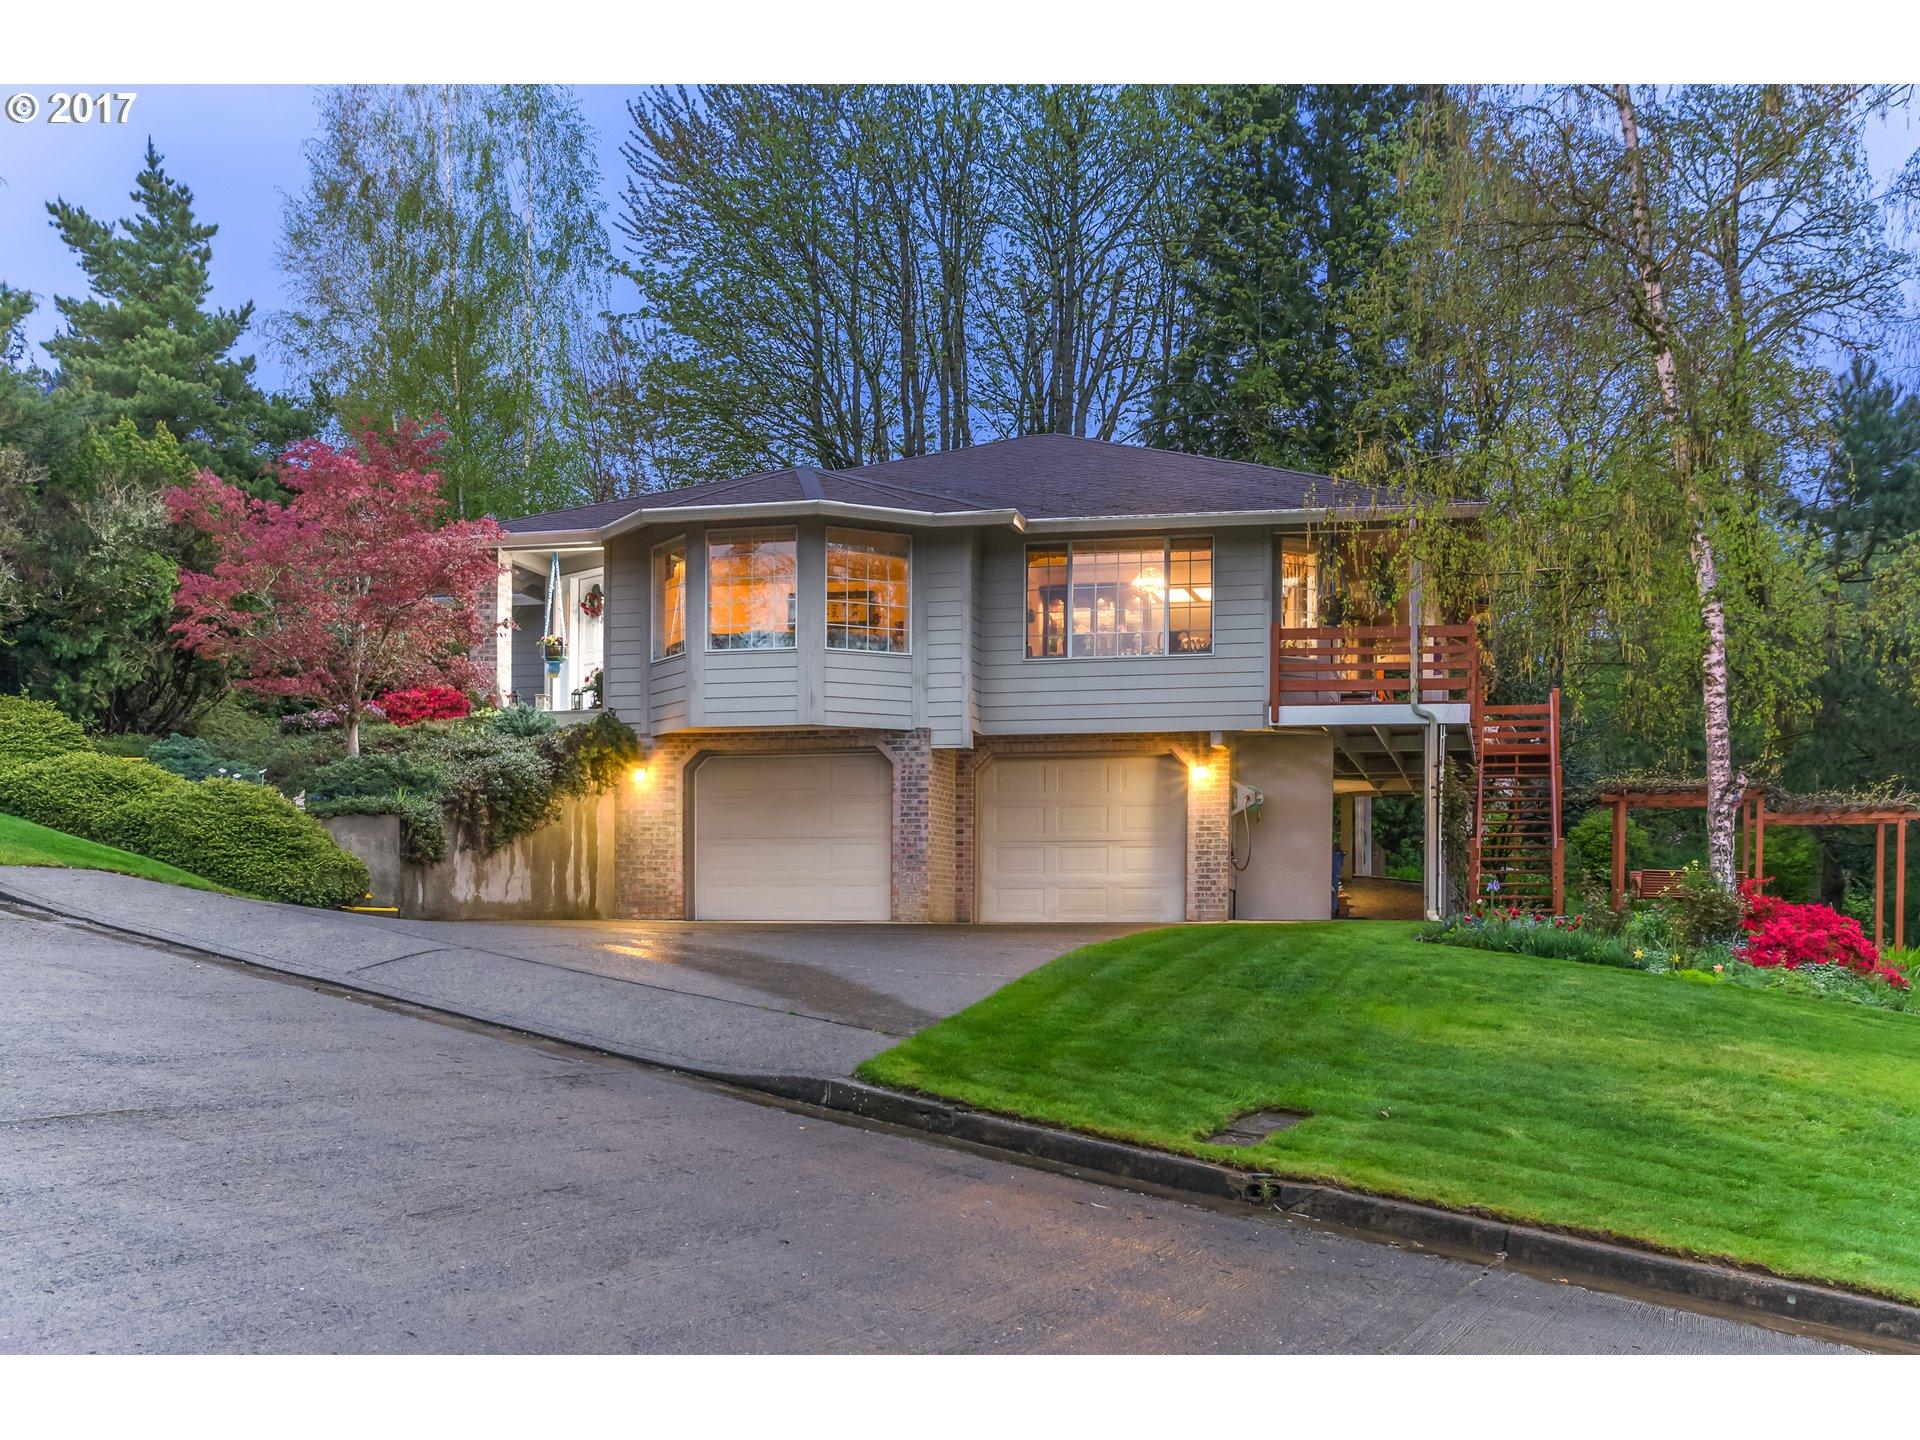 3515 SE 144TH CT, Vancouver, WA 98683